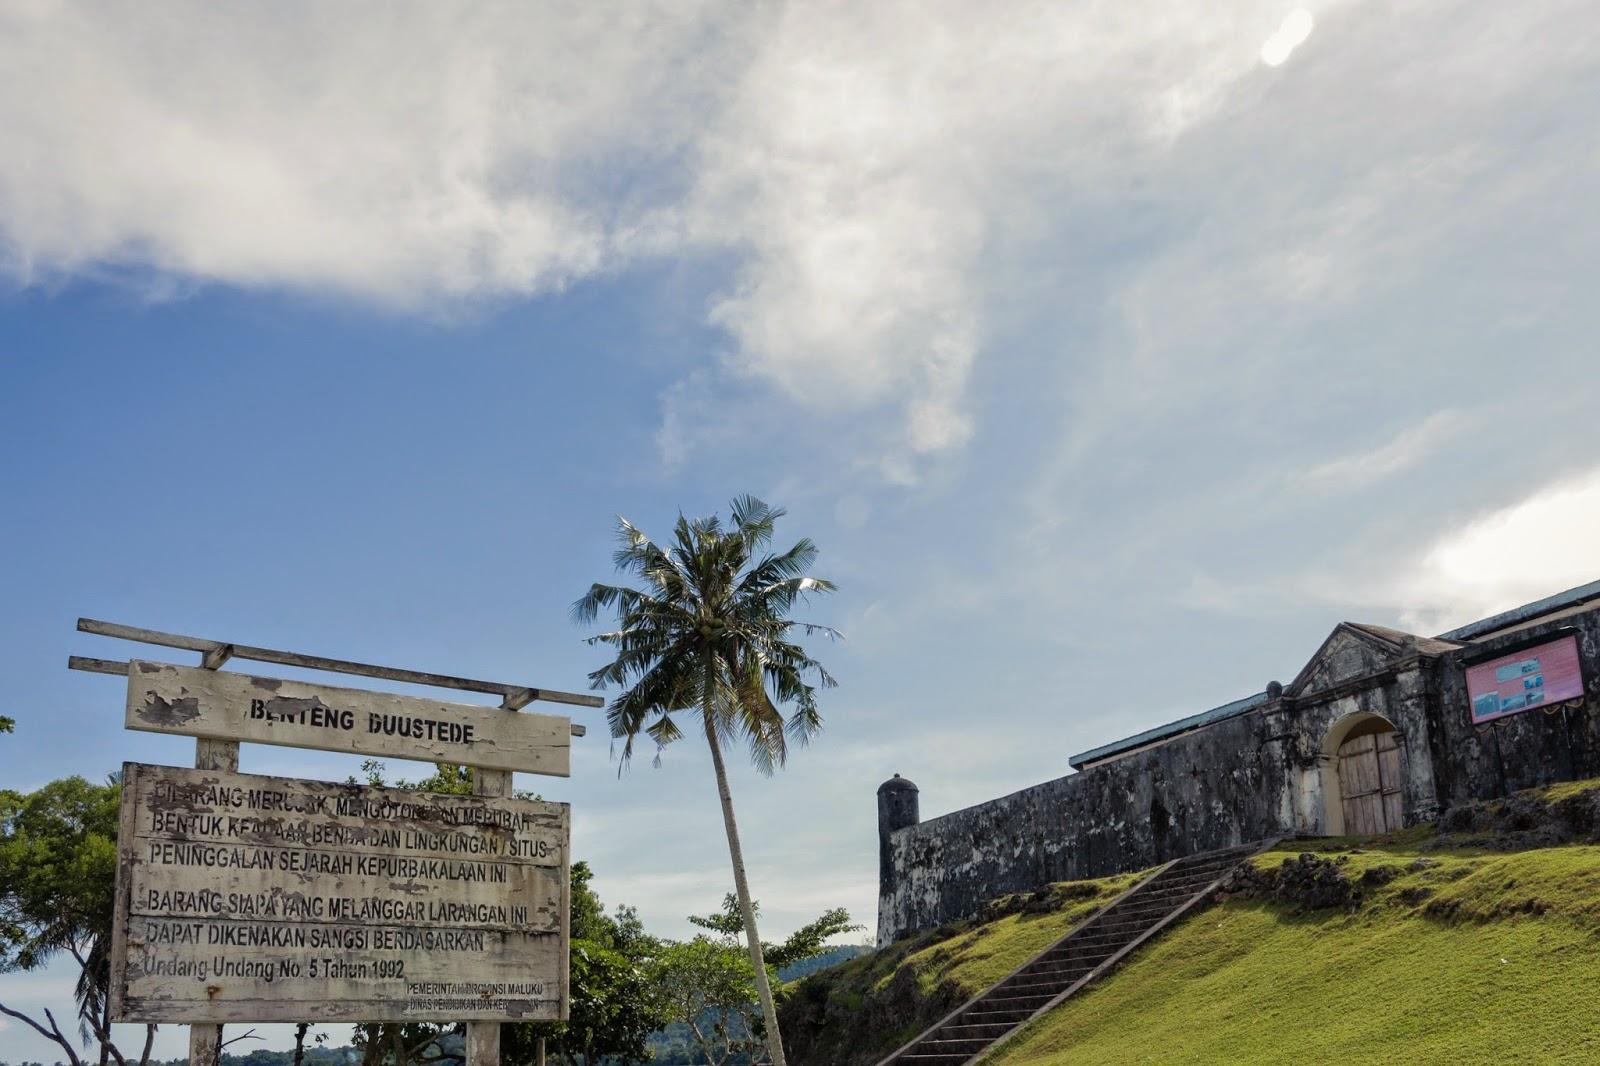 Negeri Ulath Ouw Saparua Maluku Tengah Manise Benteng Duurstede Pantai